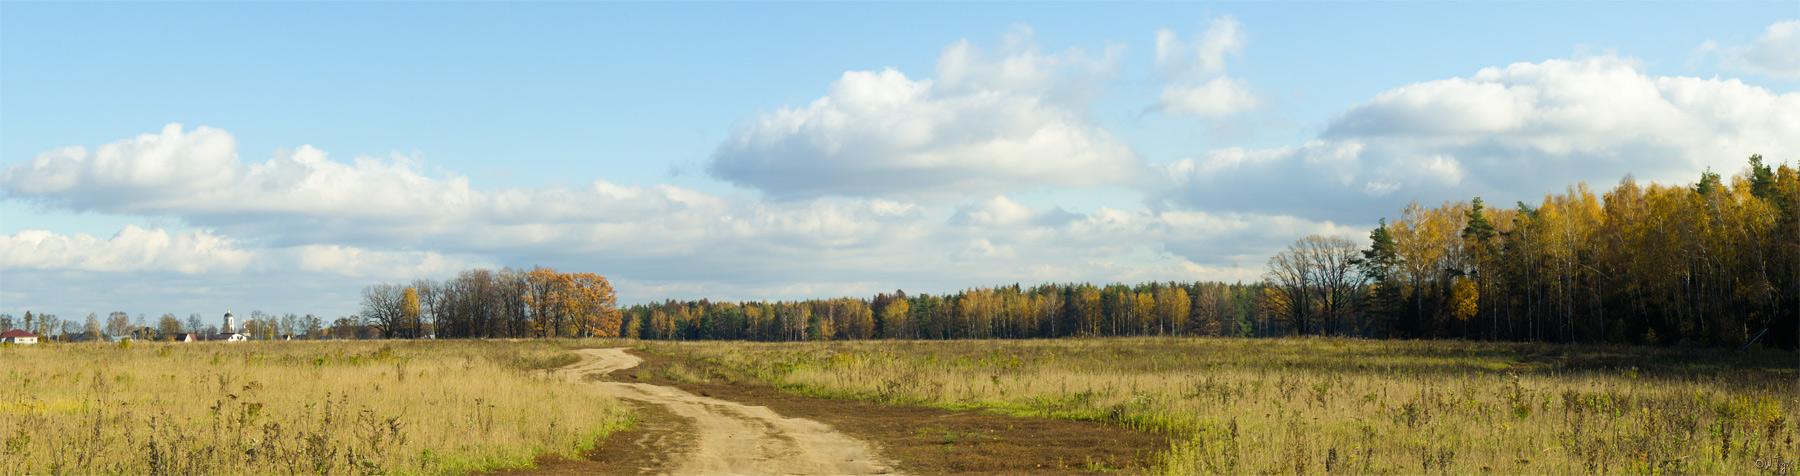 "фото ""Осенний пейзаж с облаками"" метки: пейзаж, облака, осень"